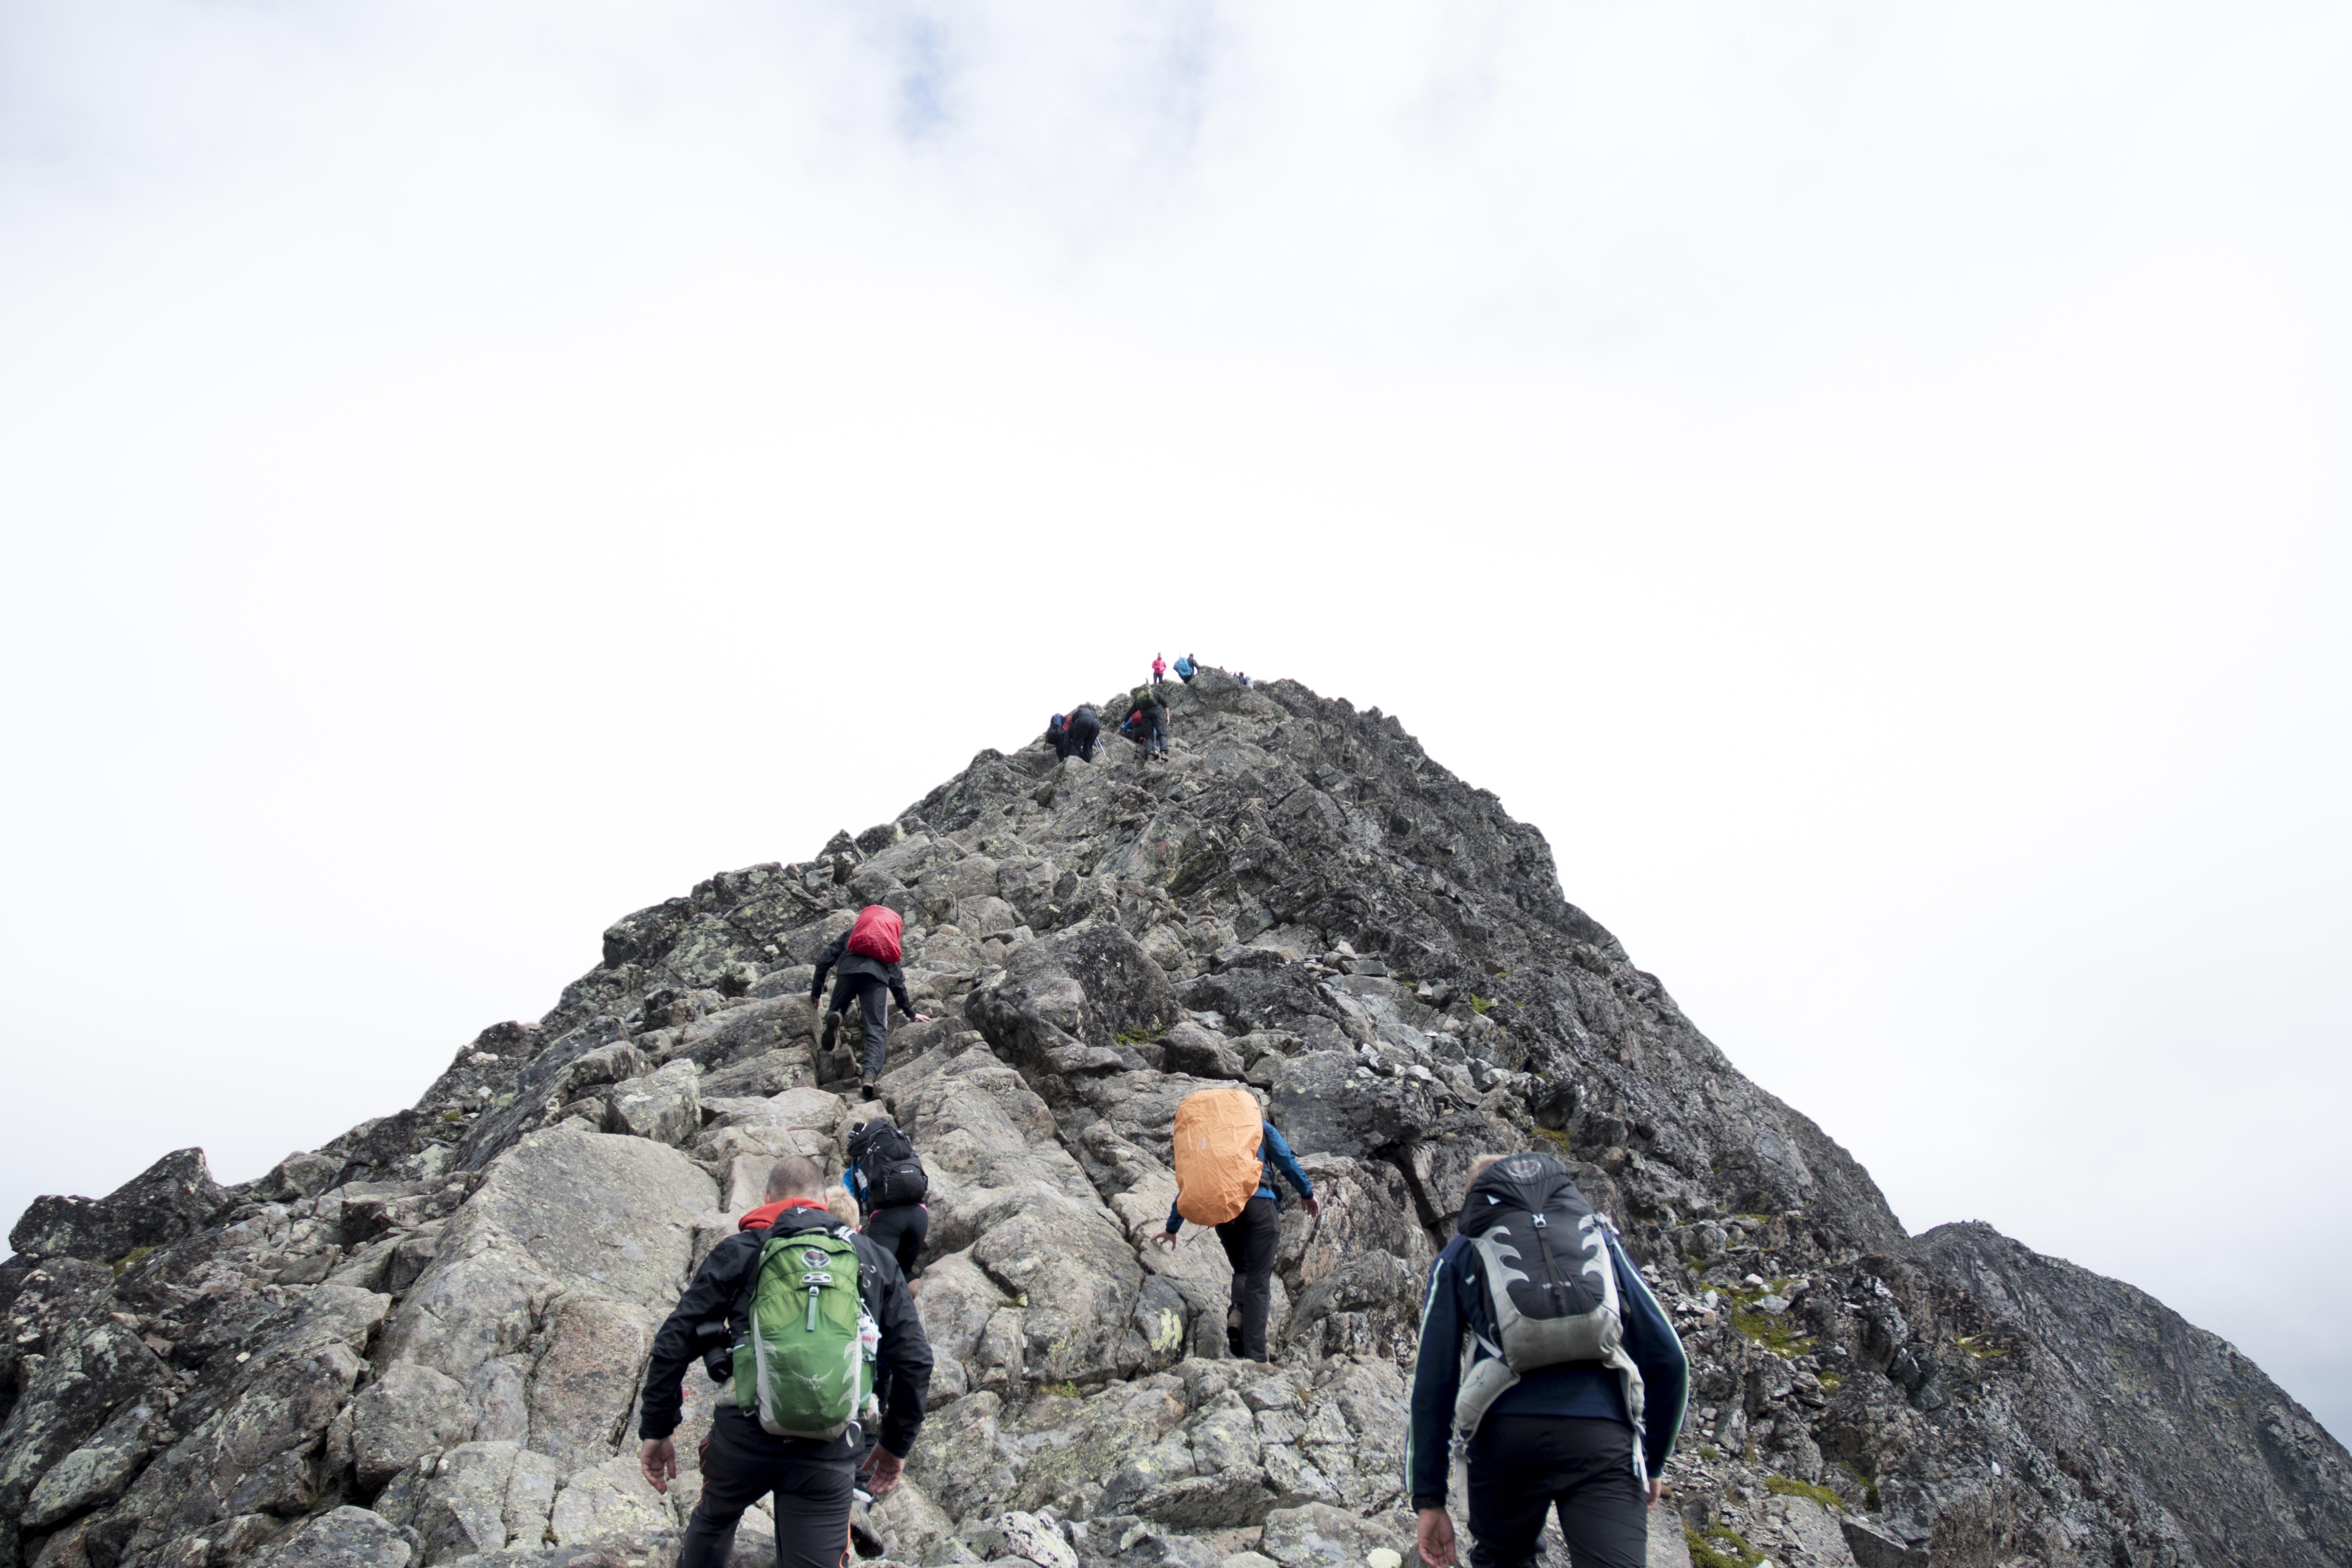 Hikers with backpacks summiting peaks of mountain